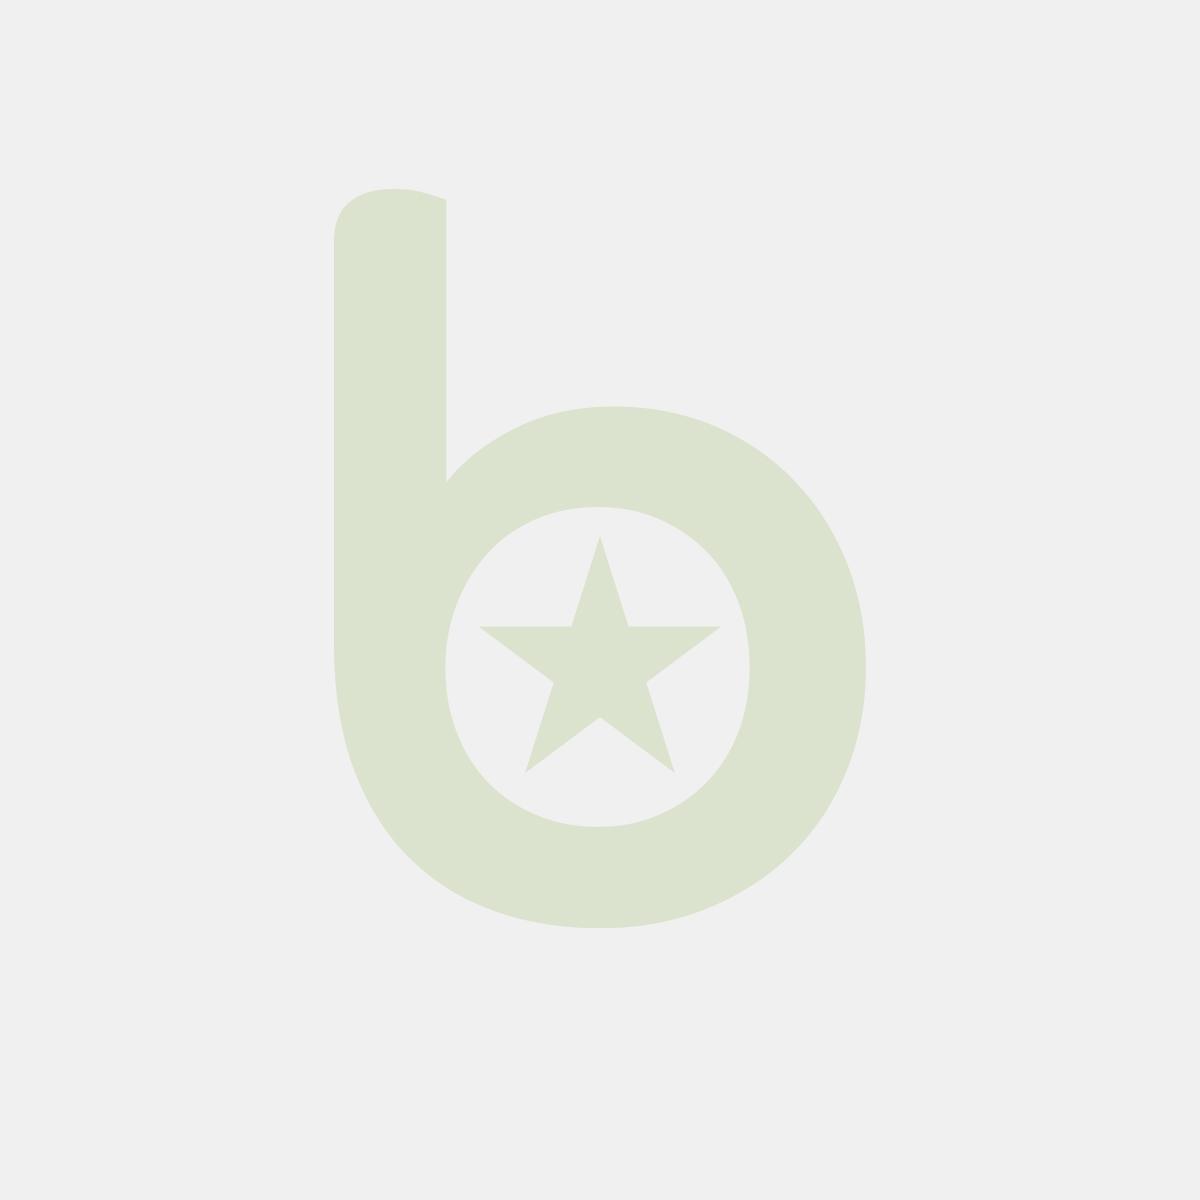 Patyczki 9cm CUBE op.100szt - FINGERFOOD